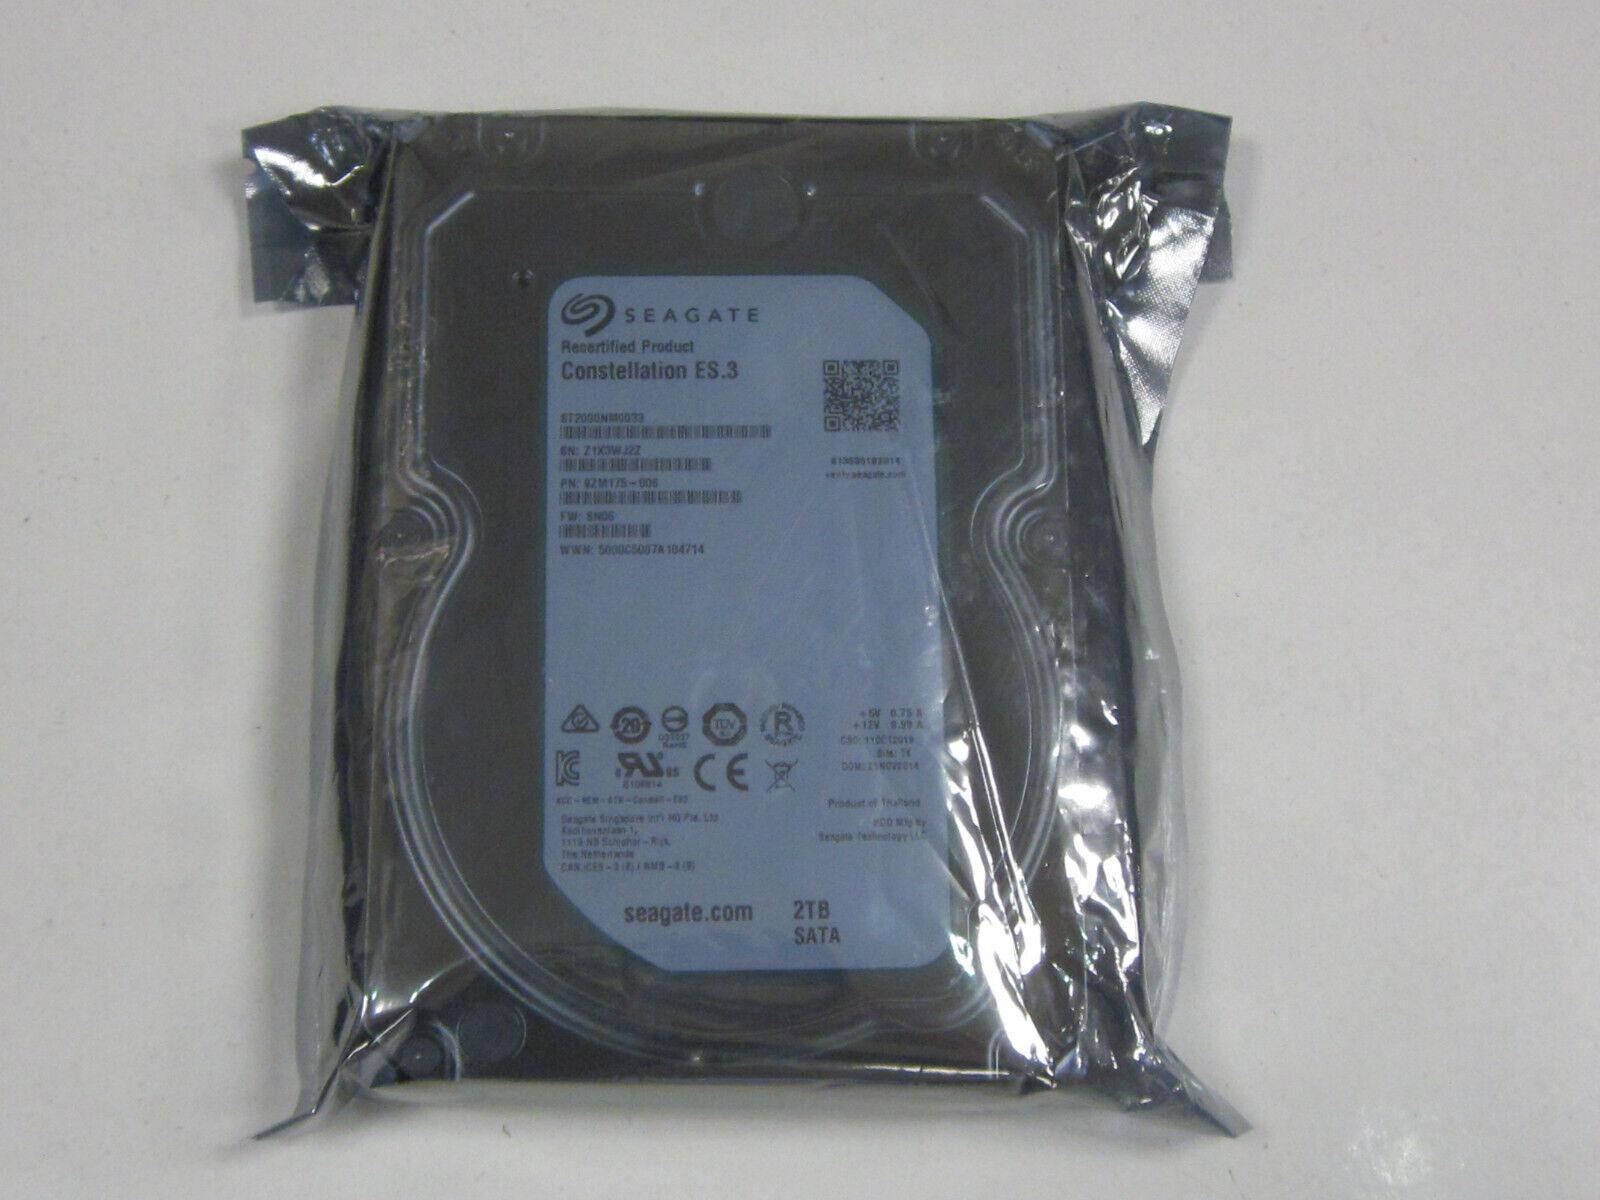 8,9 cm Seagate Constellation ES.3 ST2000NM0033 interne Festplatte 2TB 3,5 Zoll , 7200rpm, 128MB Cache, SATA